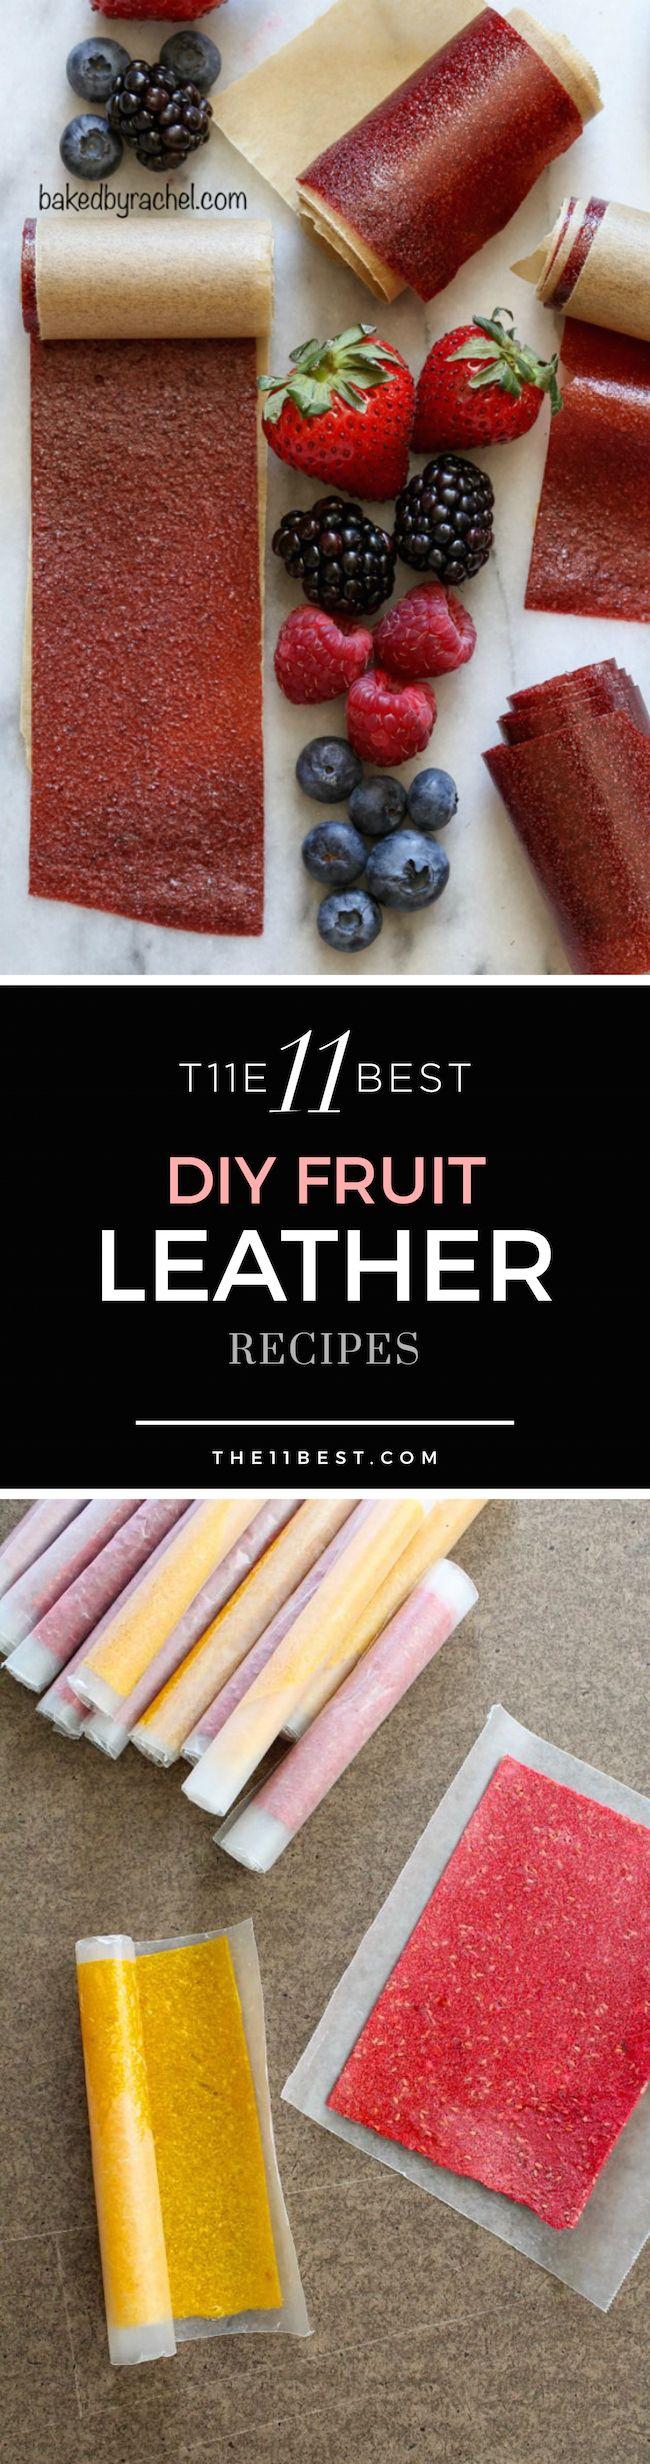 The 11 Best Fruit Leather RecipesRita Mise